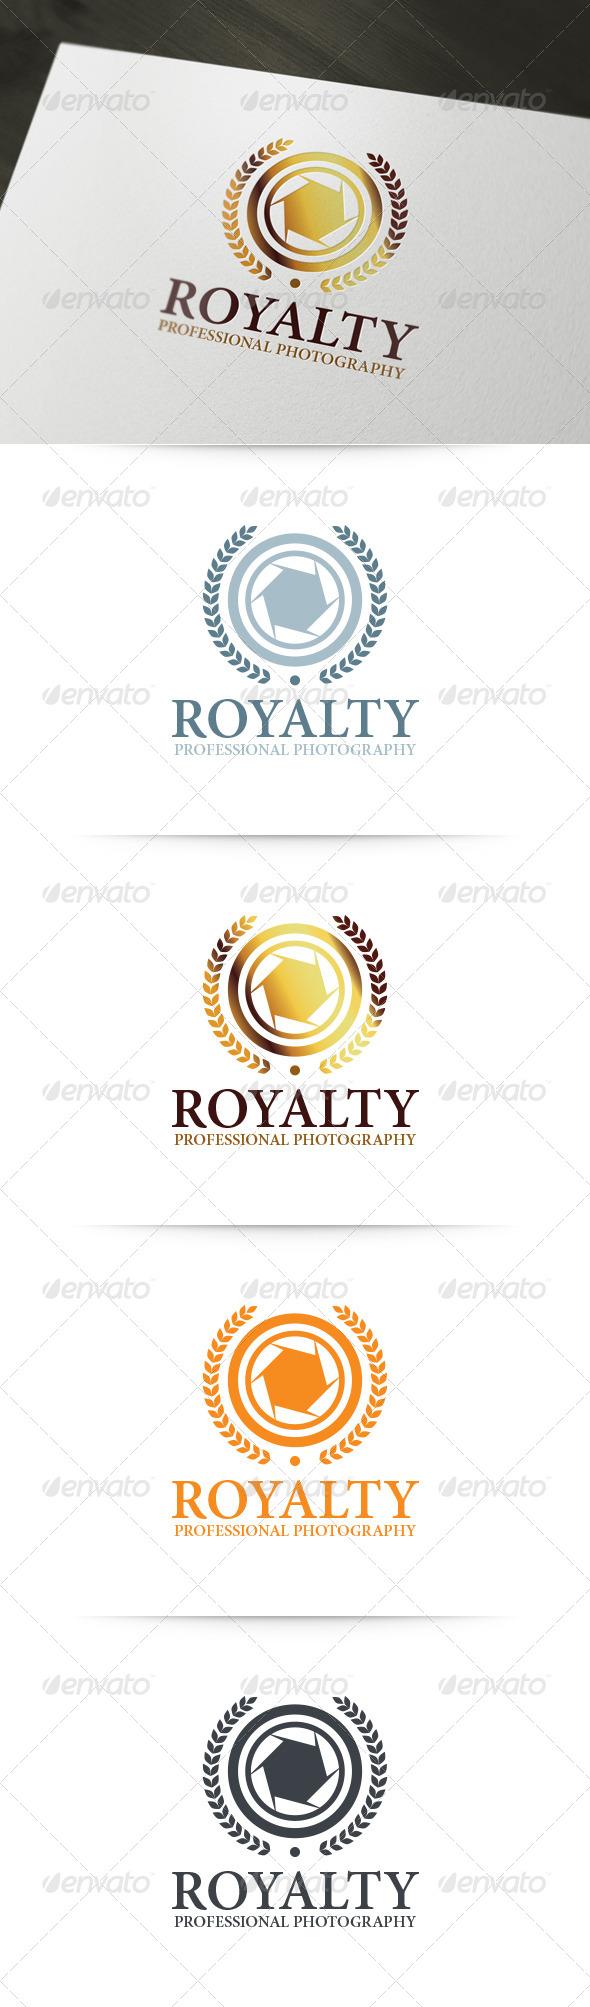 Royalty - Photography Logo